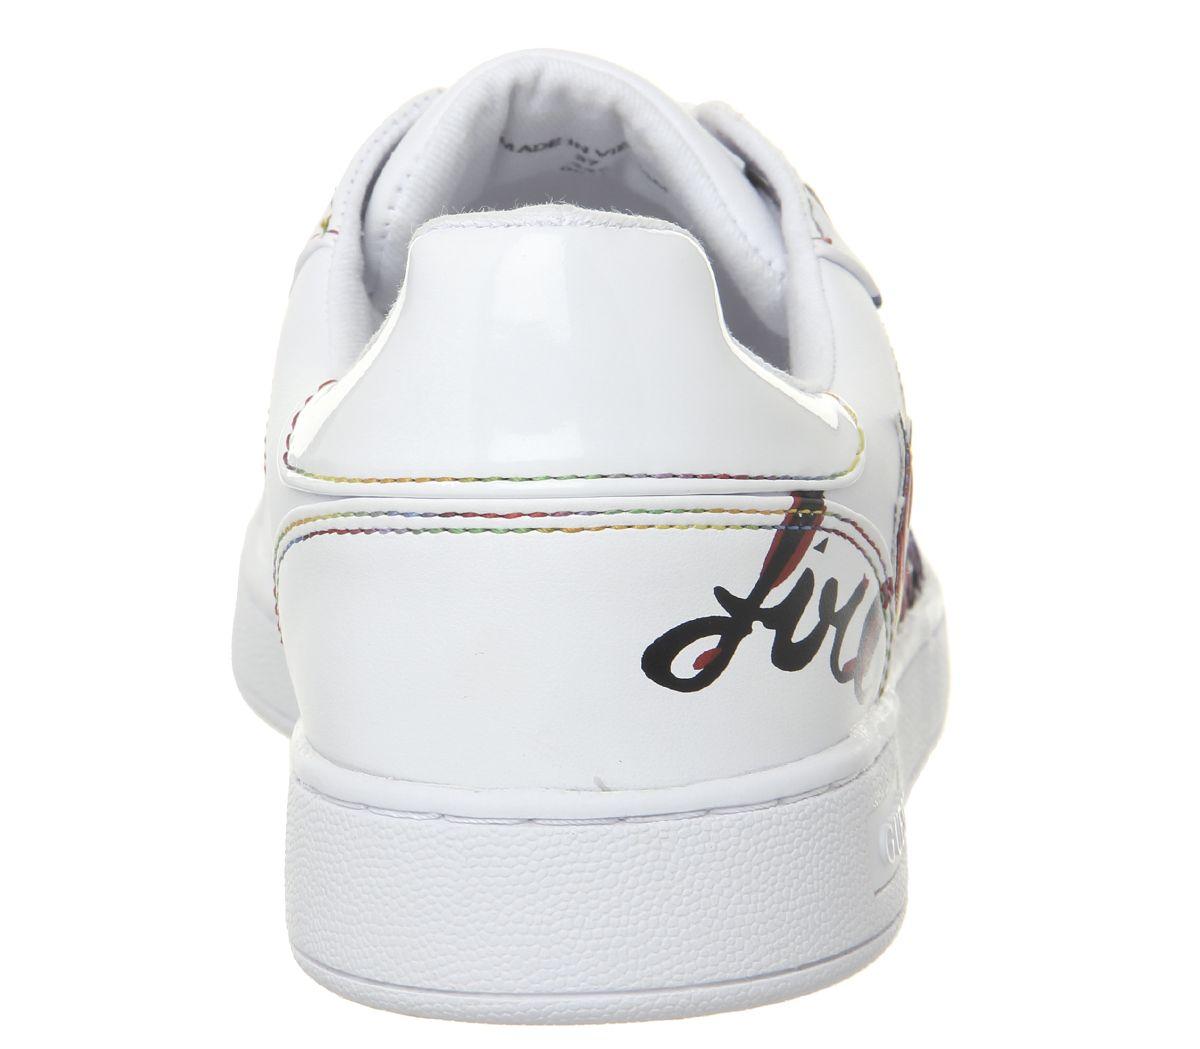 0dbd449c Womens-Guess-Crayz-Logo-Sneakers-White-Multi-Flats thumbnail